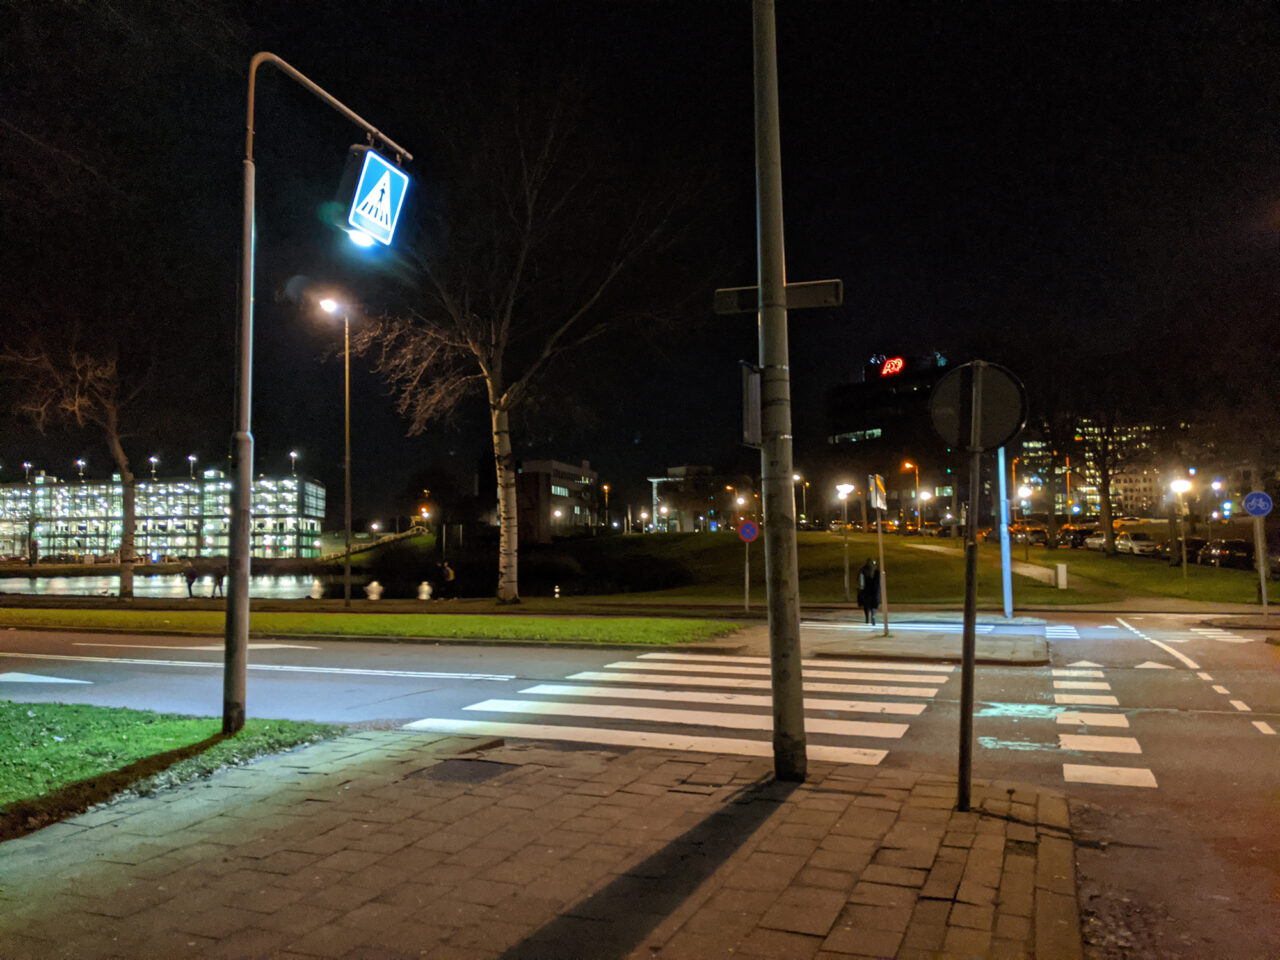 2020-01-22 Zebrapad Kralingse Zoom nacht